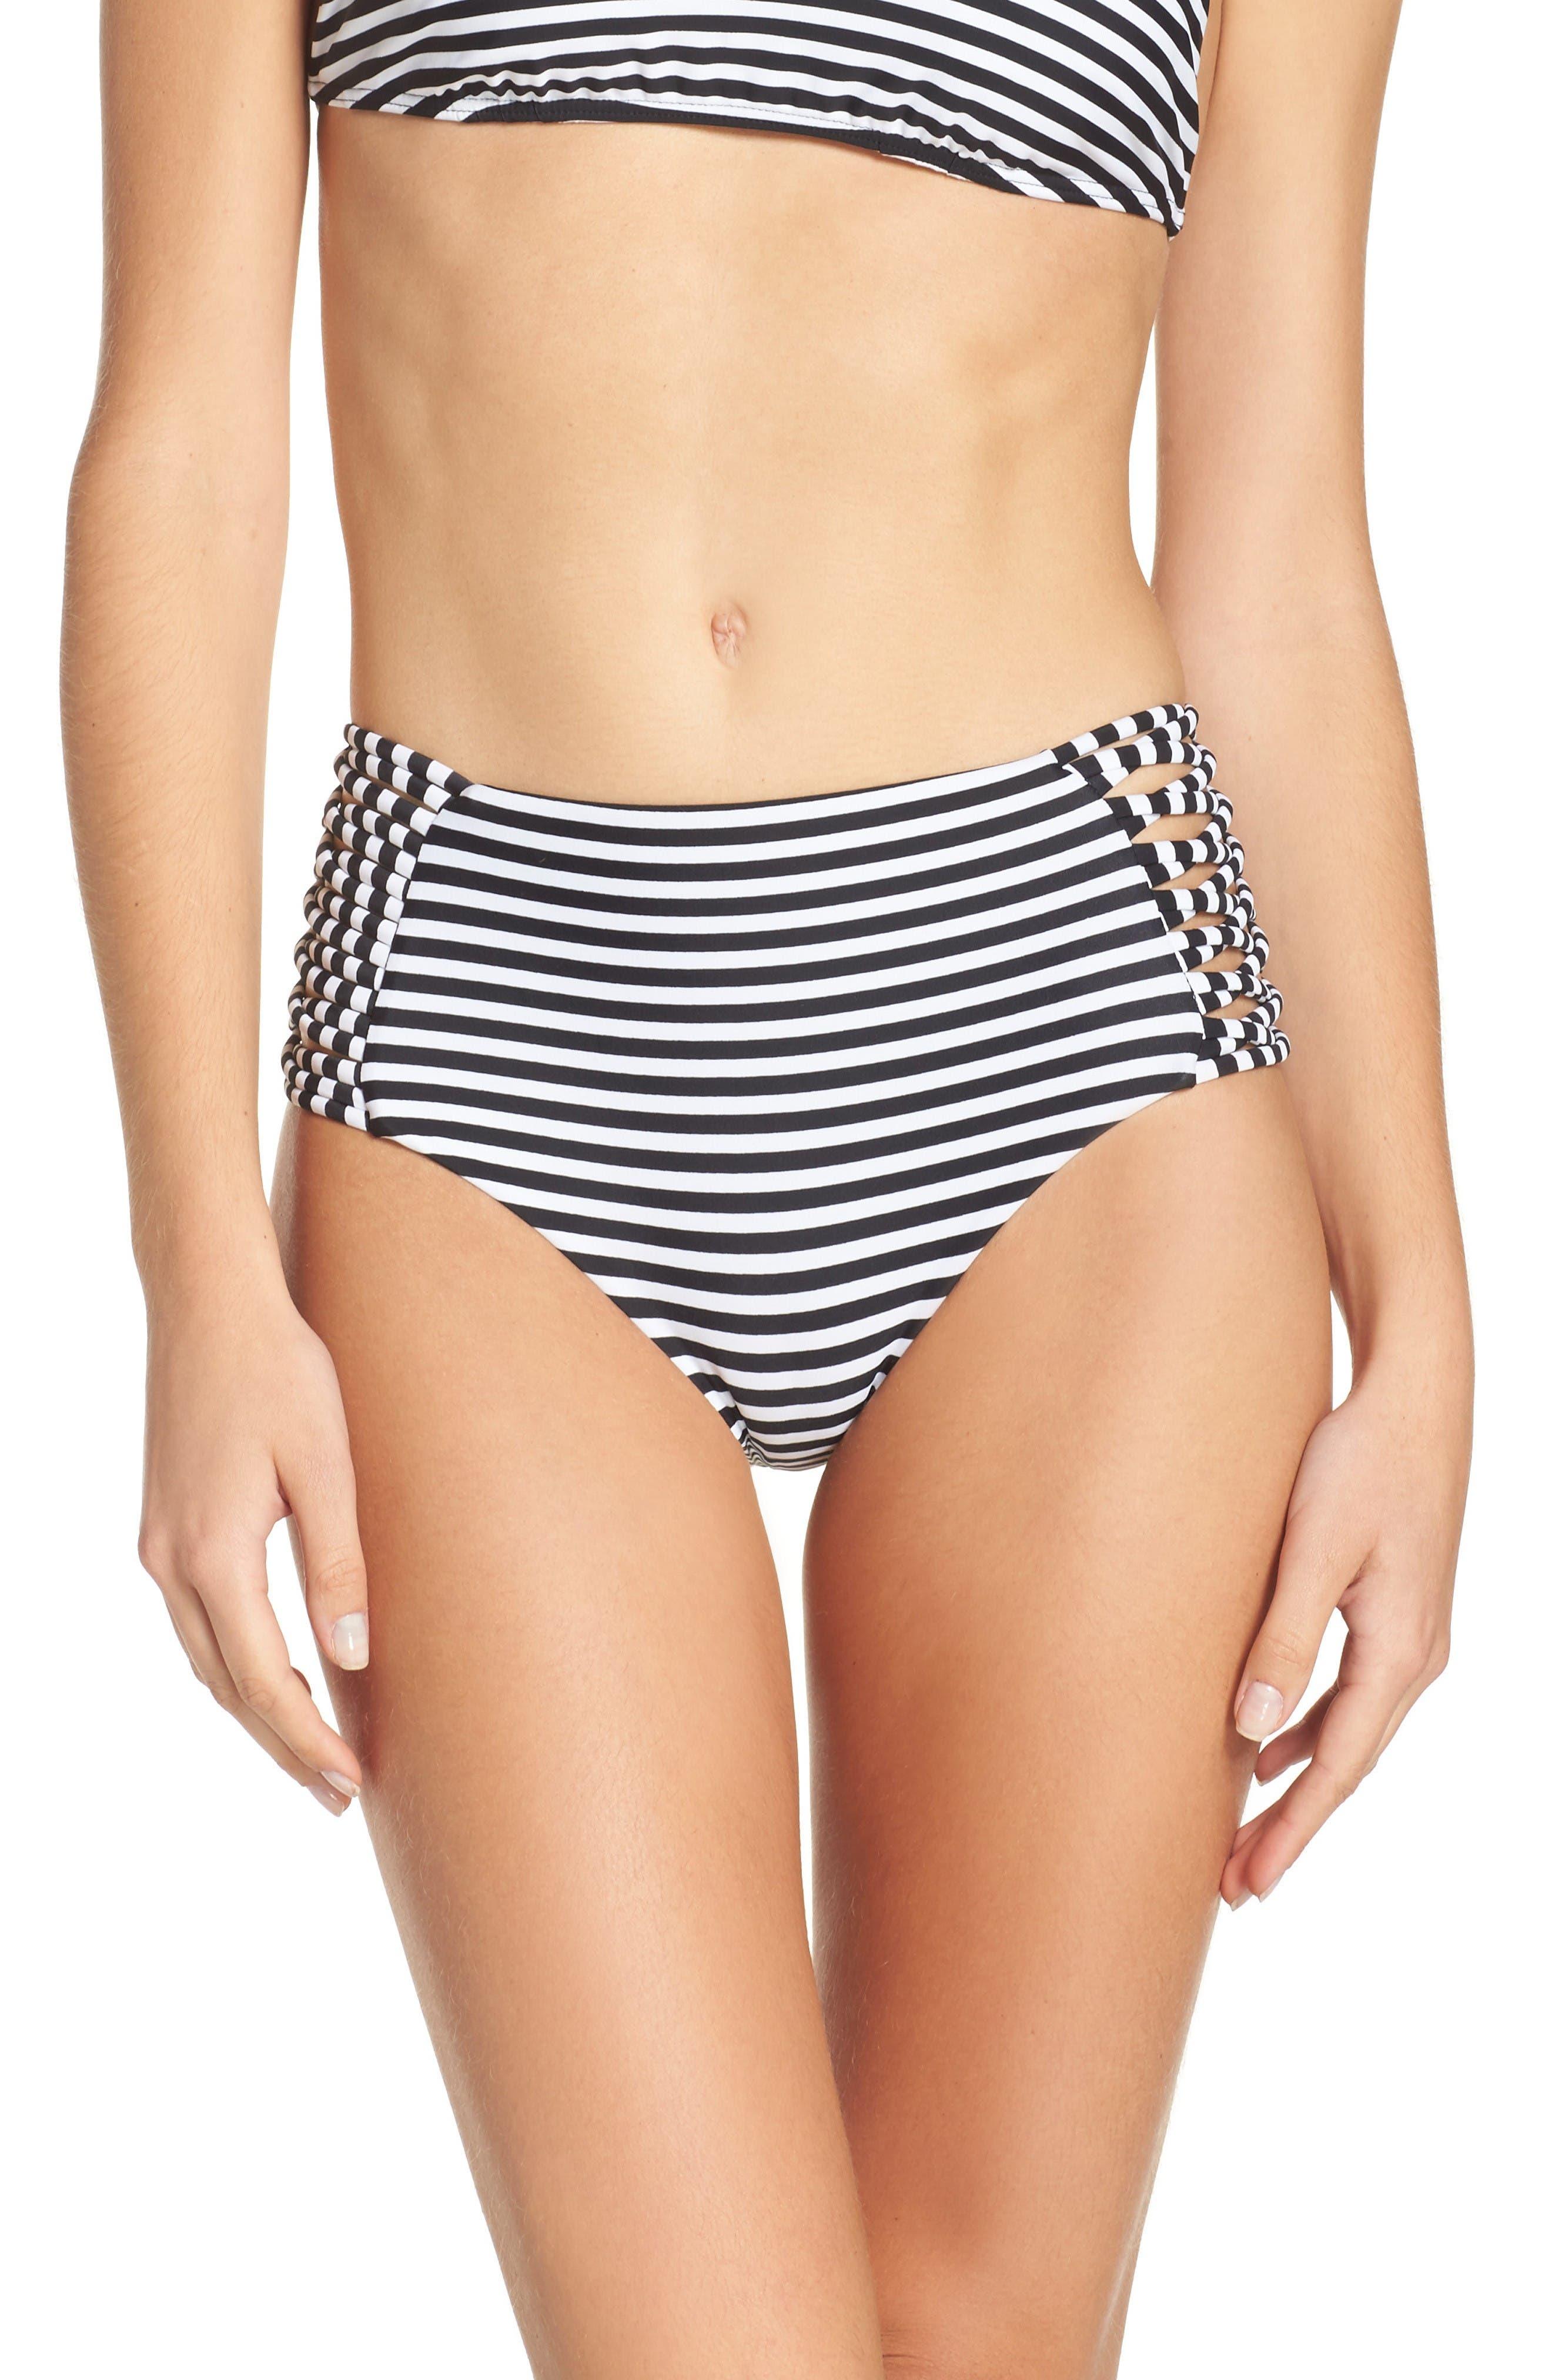 Main Image - Byrds of Paradise Morrissey High Waist Bikini Bottoms